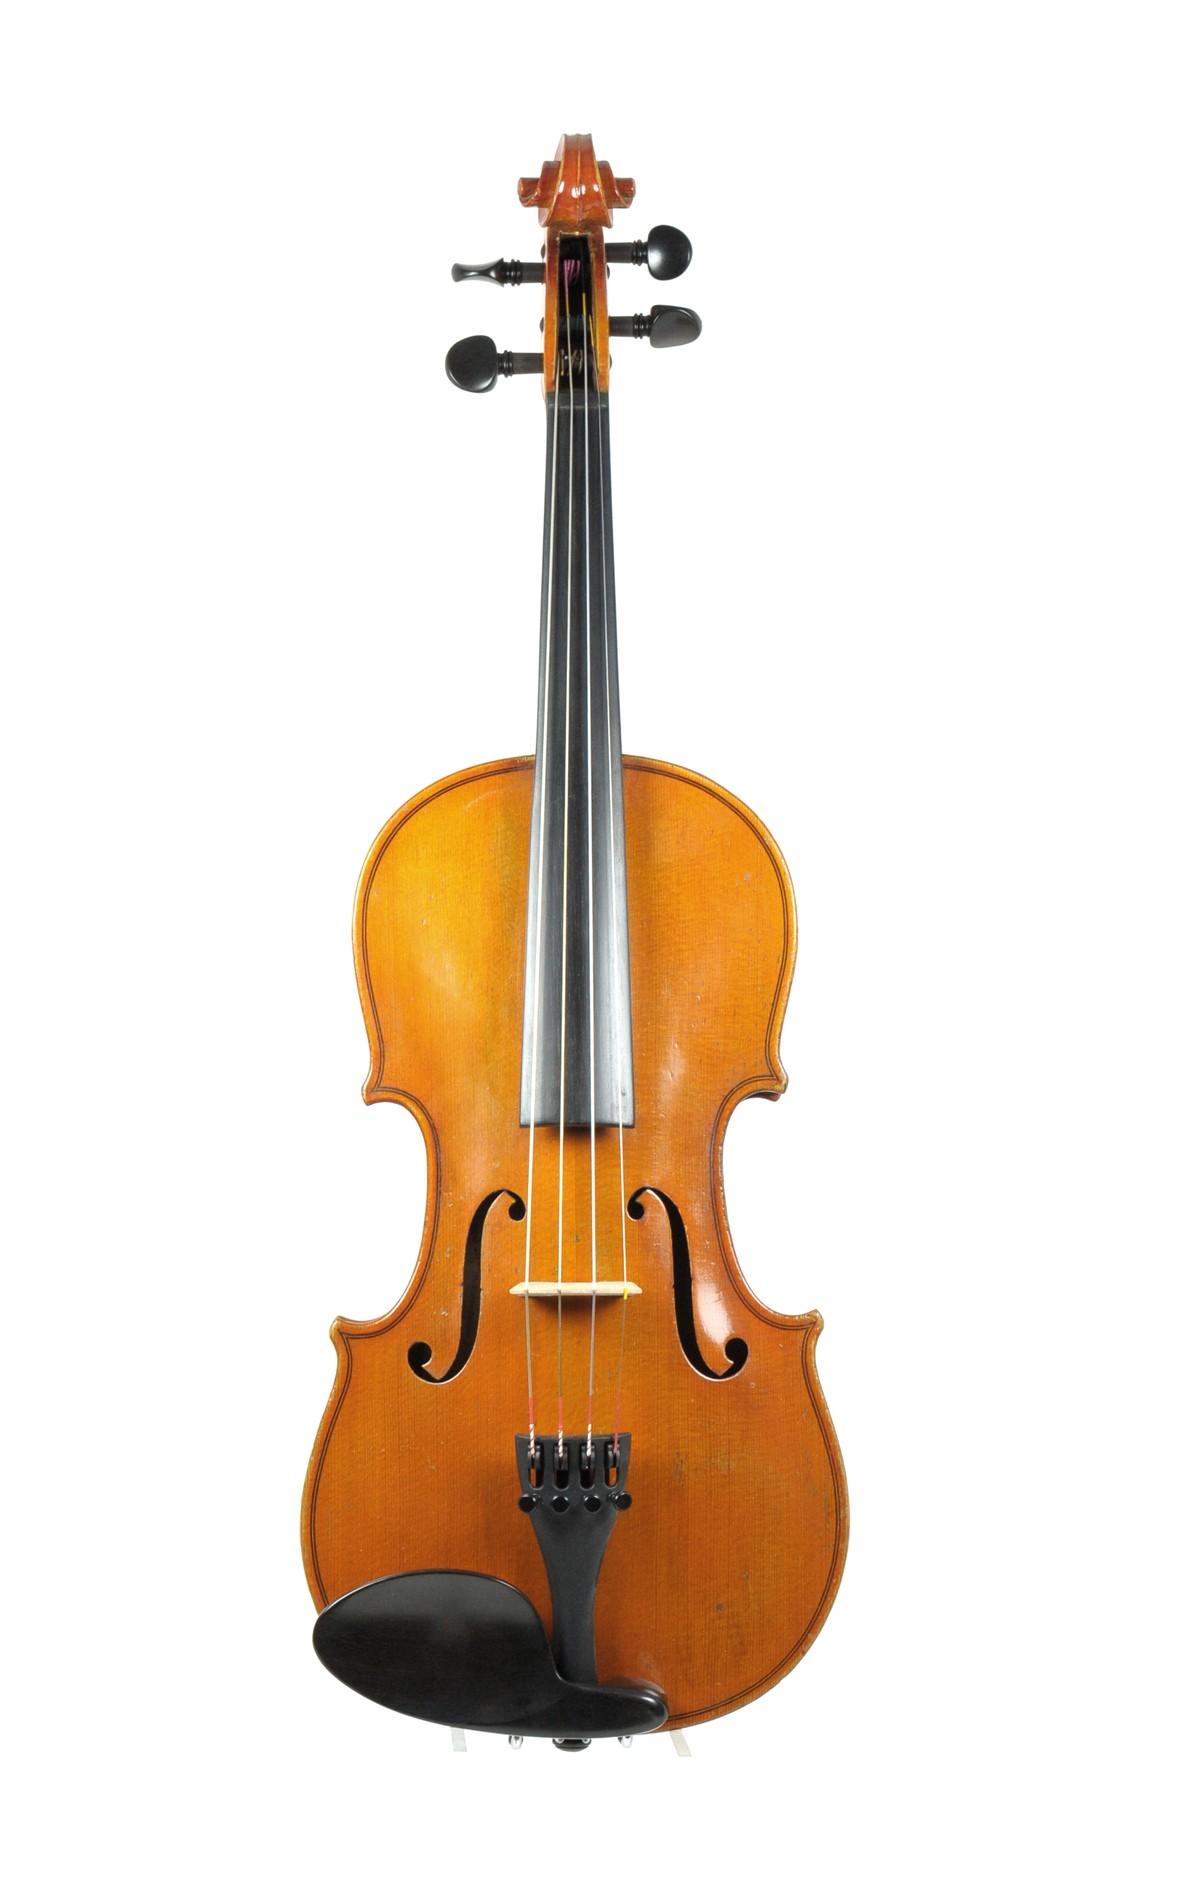 Eberhard Meinel MUSIMS master violin 1966 - top